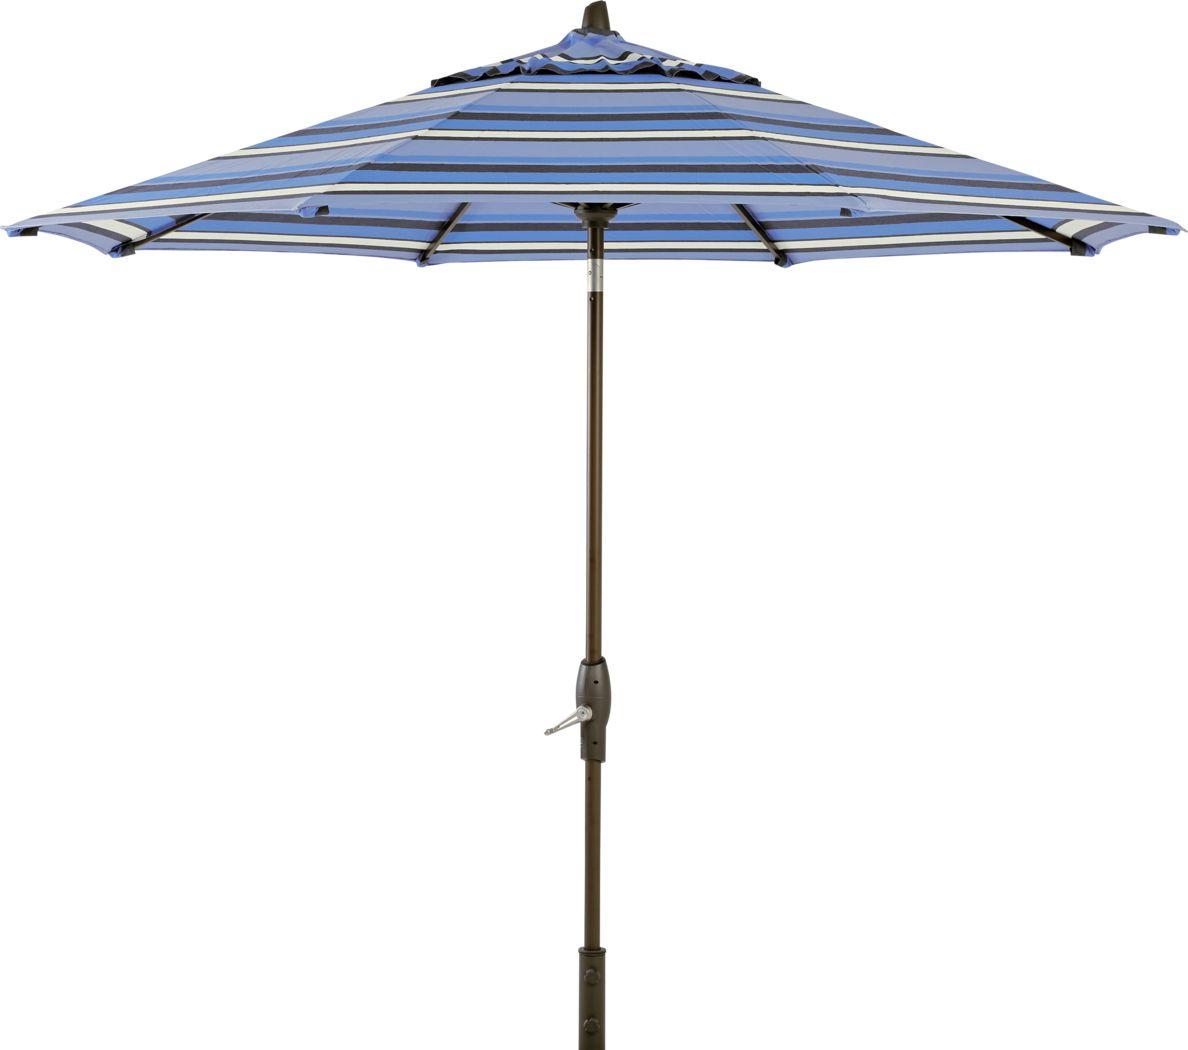 Seaport 9' Octagon Blue Outdoor Umbrella